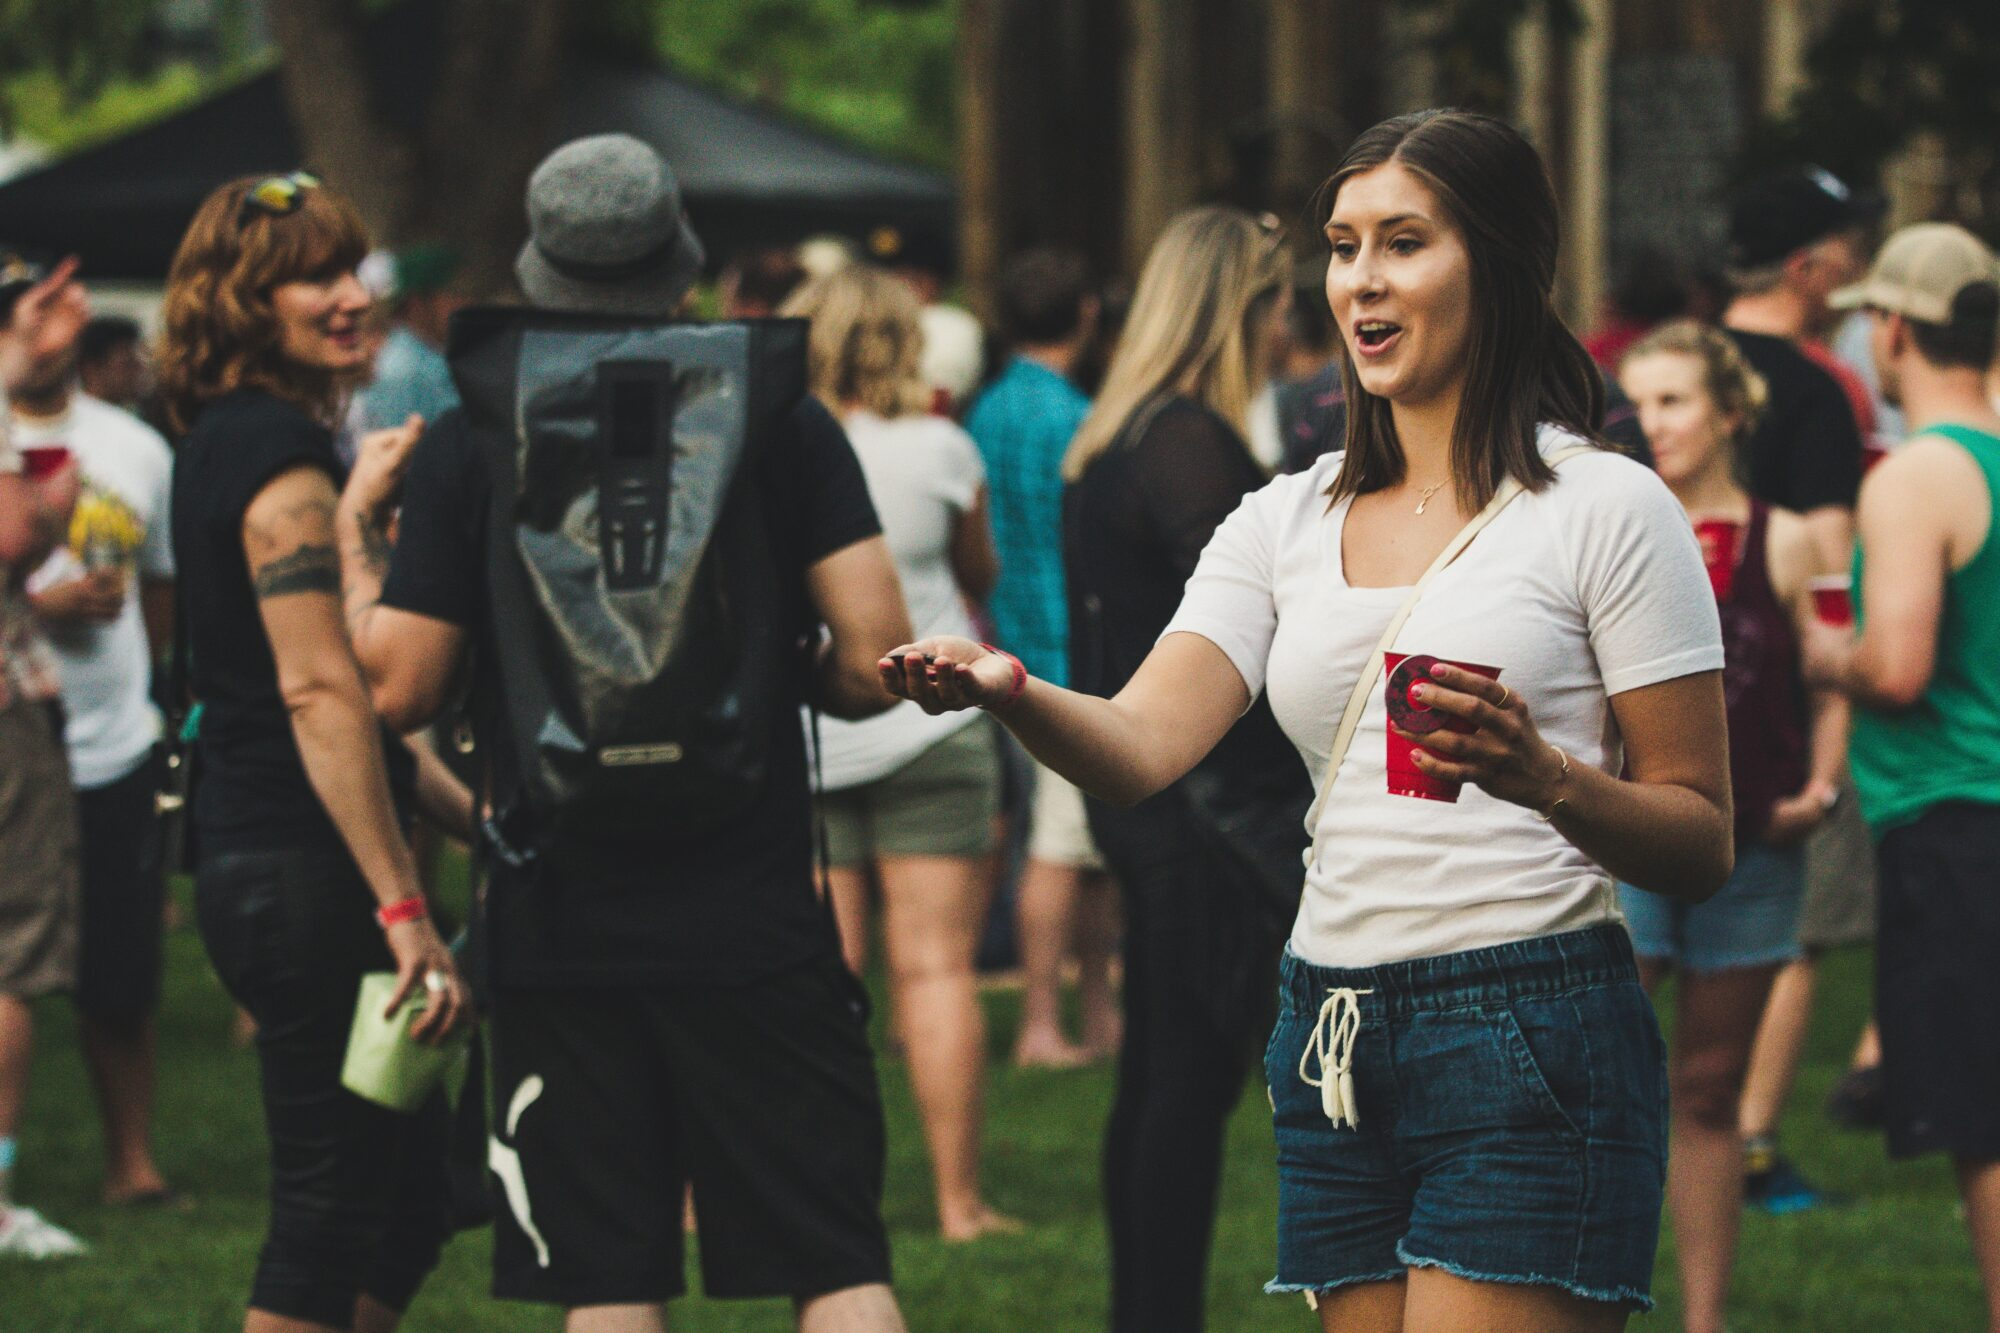 Tinder festivalmodus